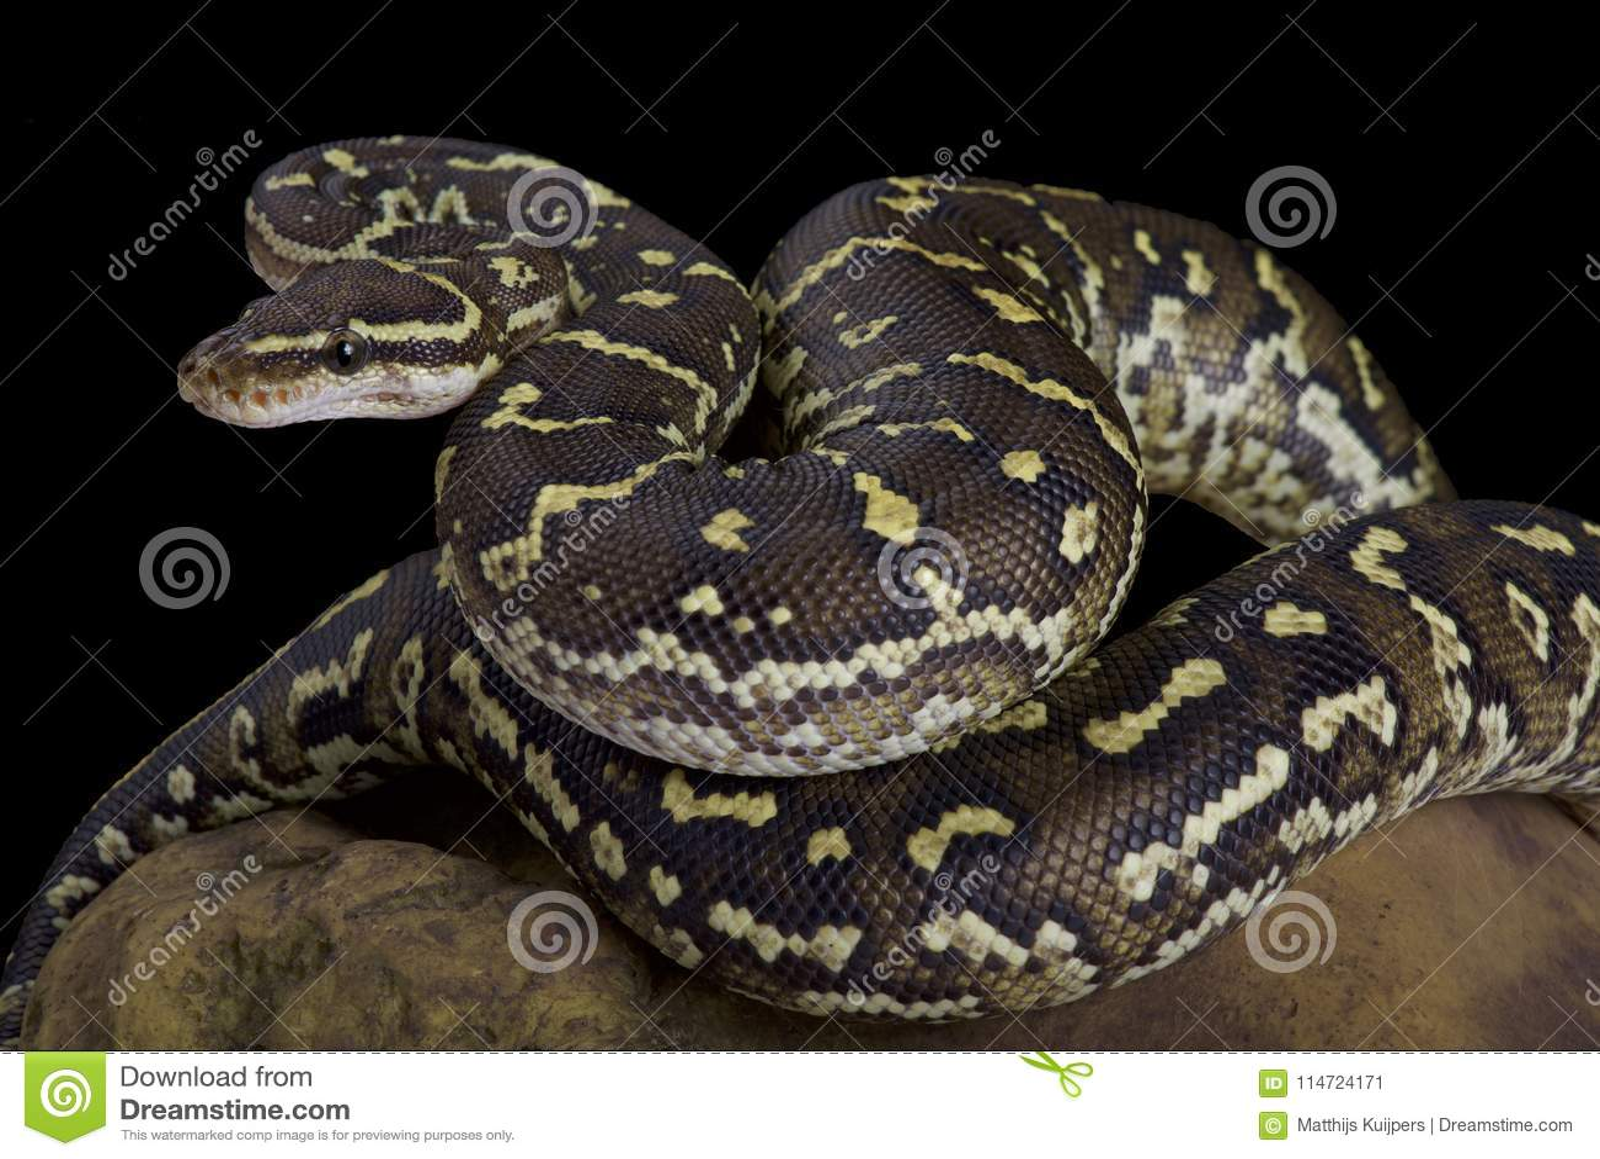 Angola-Pythonschlange, Pythonschlange anchietae